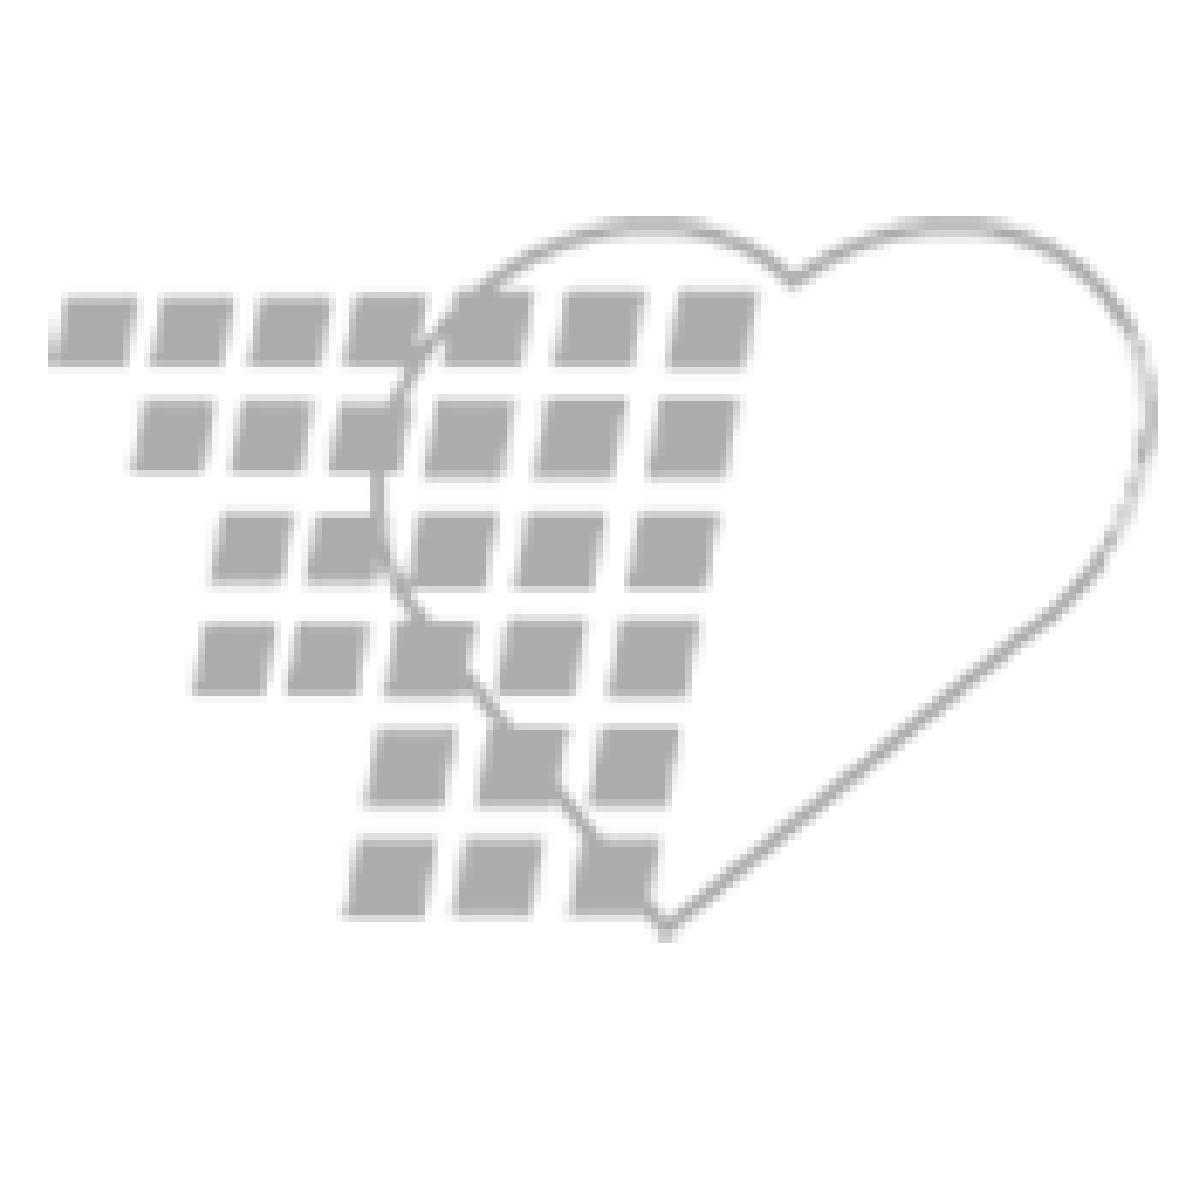 06-93-9031 Demo Dose® Captoprl (Capotn) 25 mg - 100/Bottle